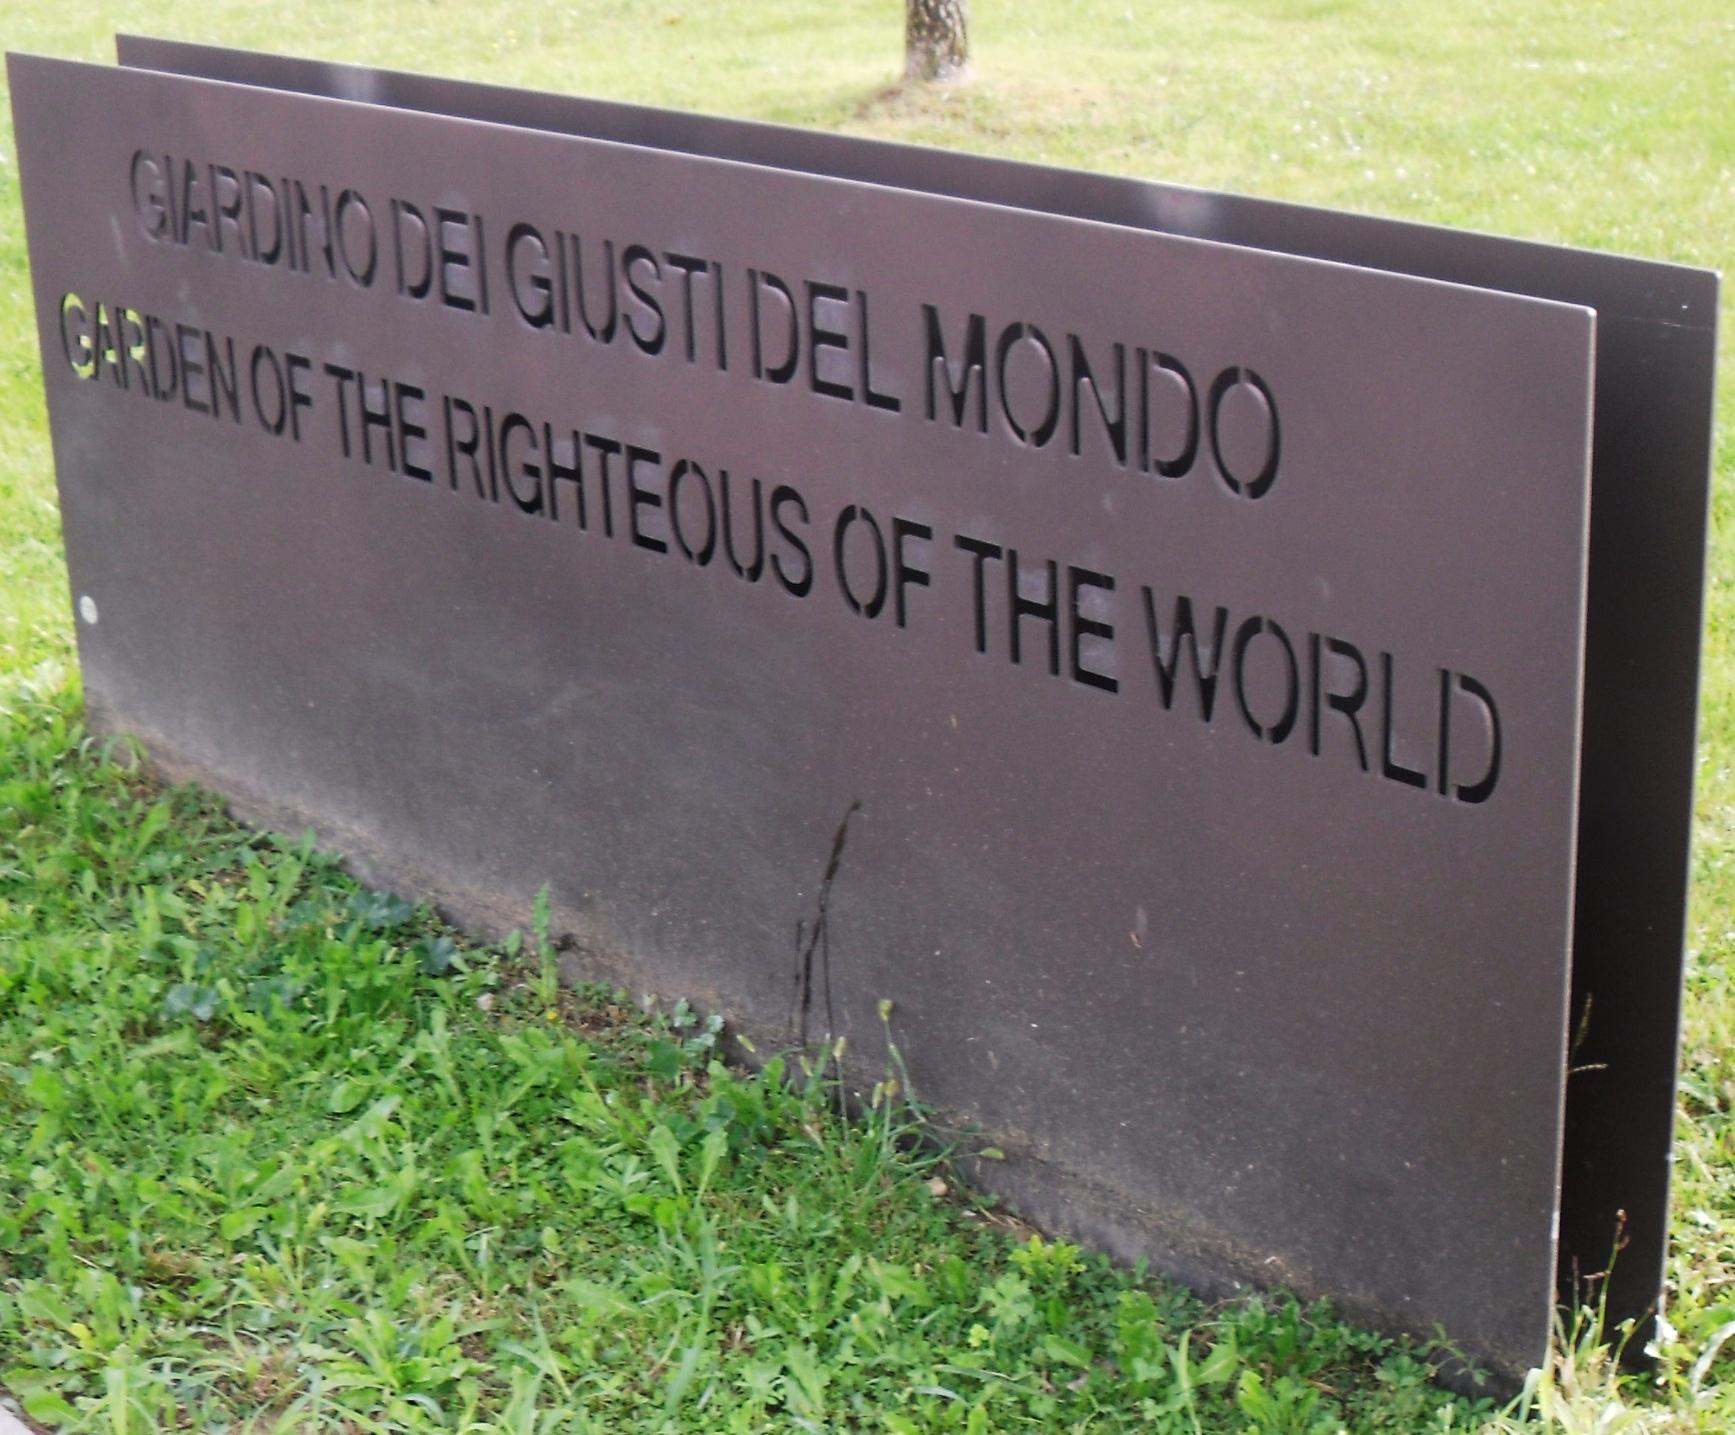 Giardino dei Giusti del Mondo - Wikipedia